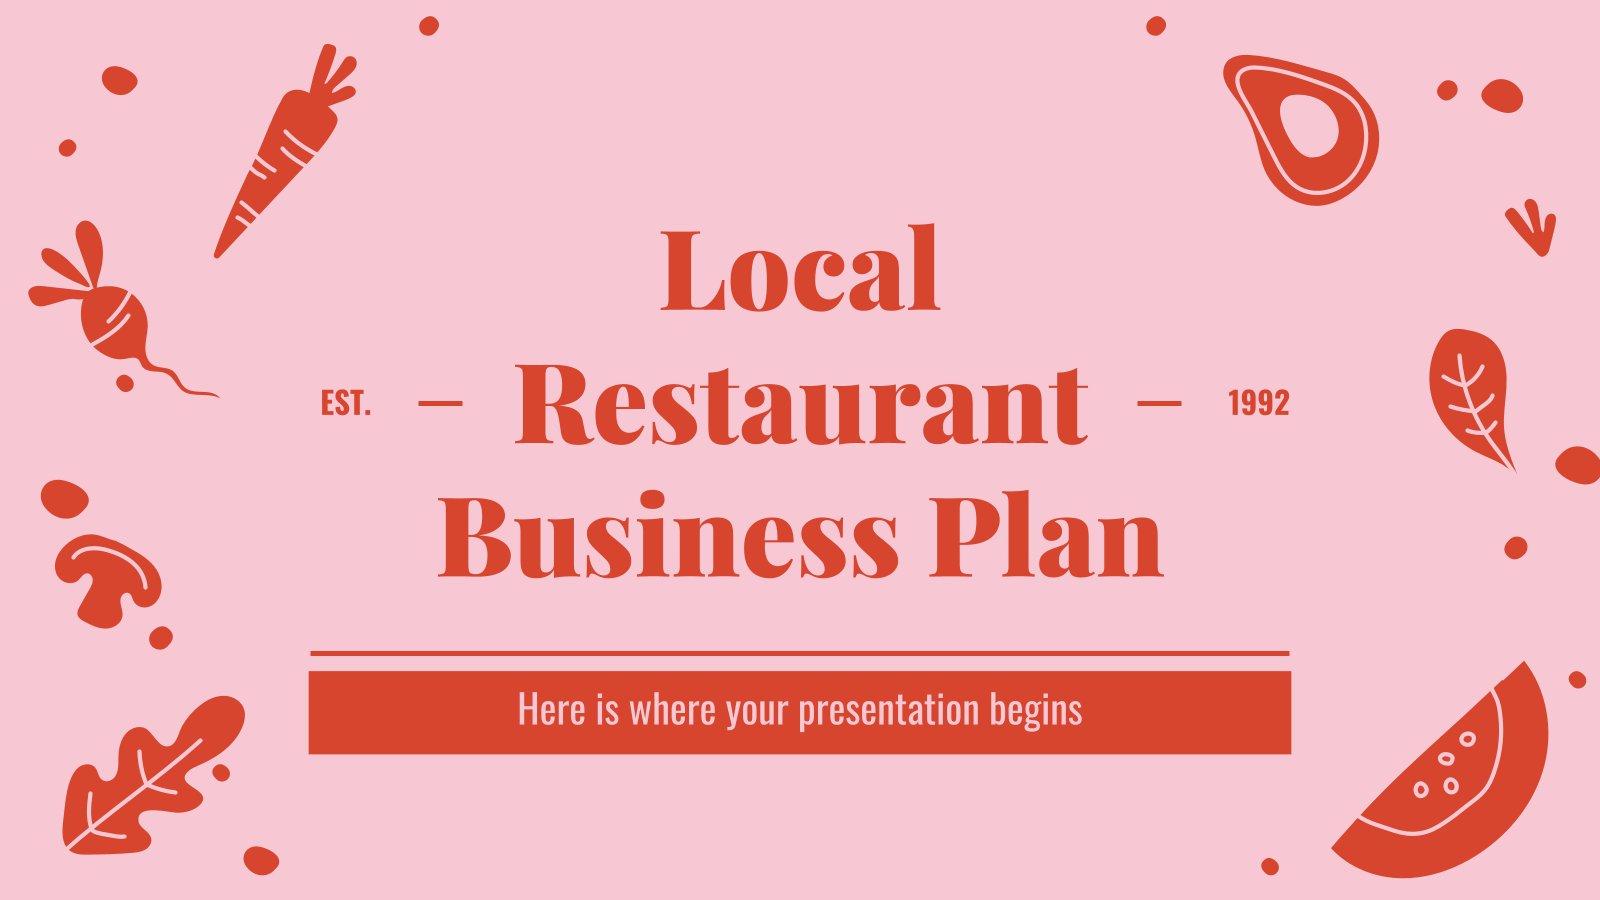 Local Restaurant Business Plan presentation template